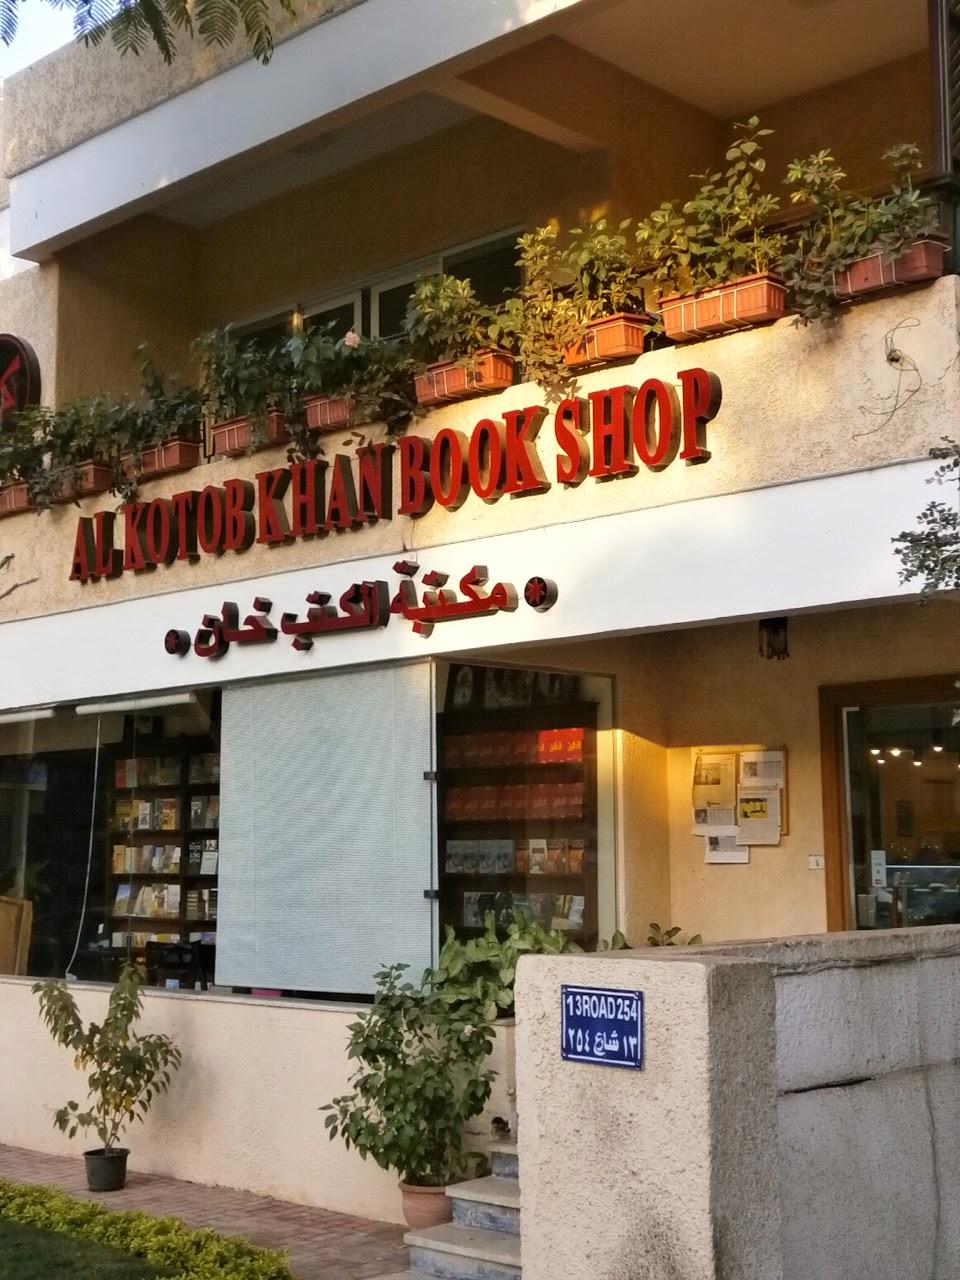 Cairo booklore al kotob khan book shop for Cairo outlet